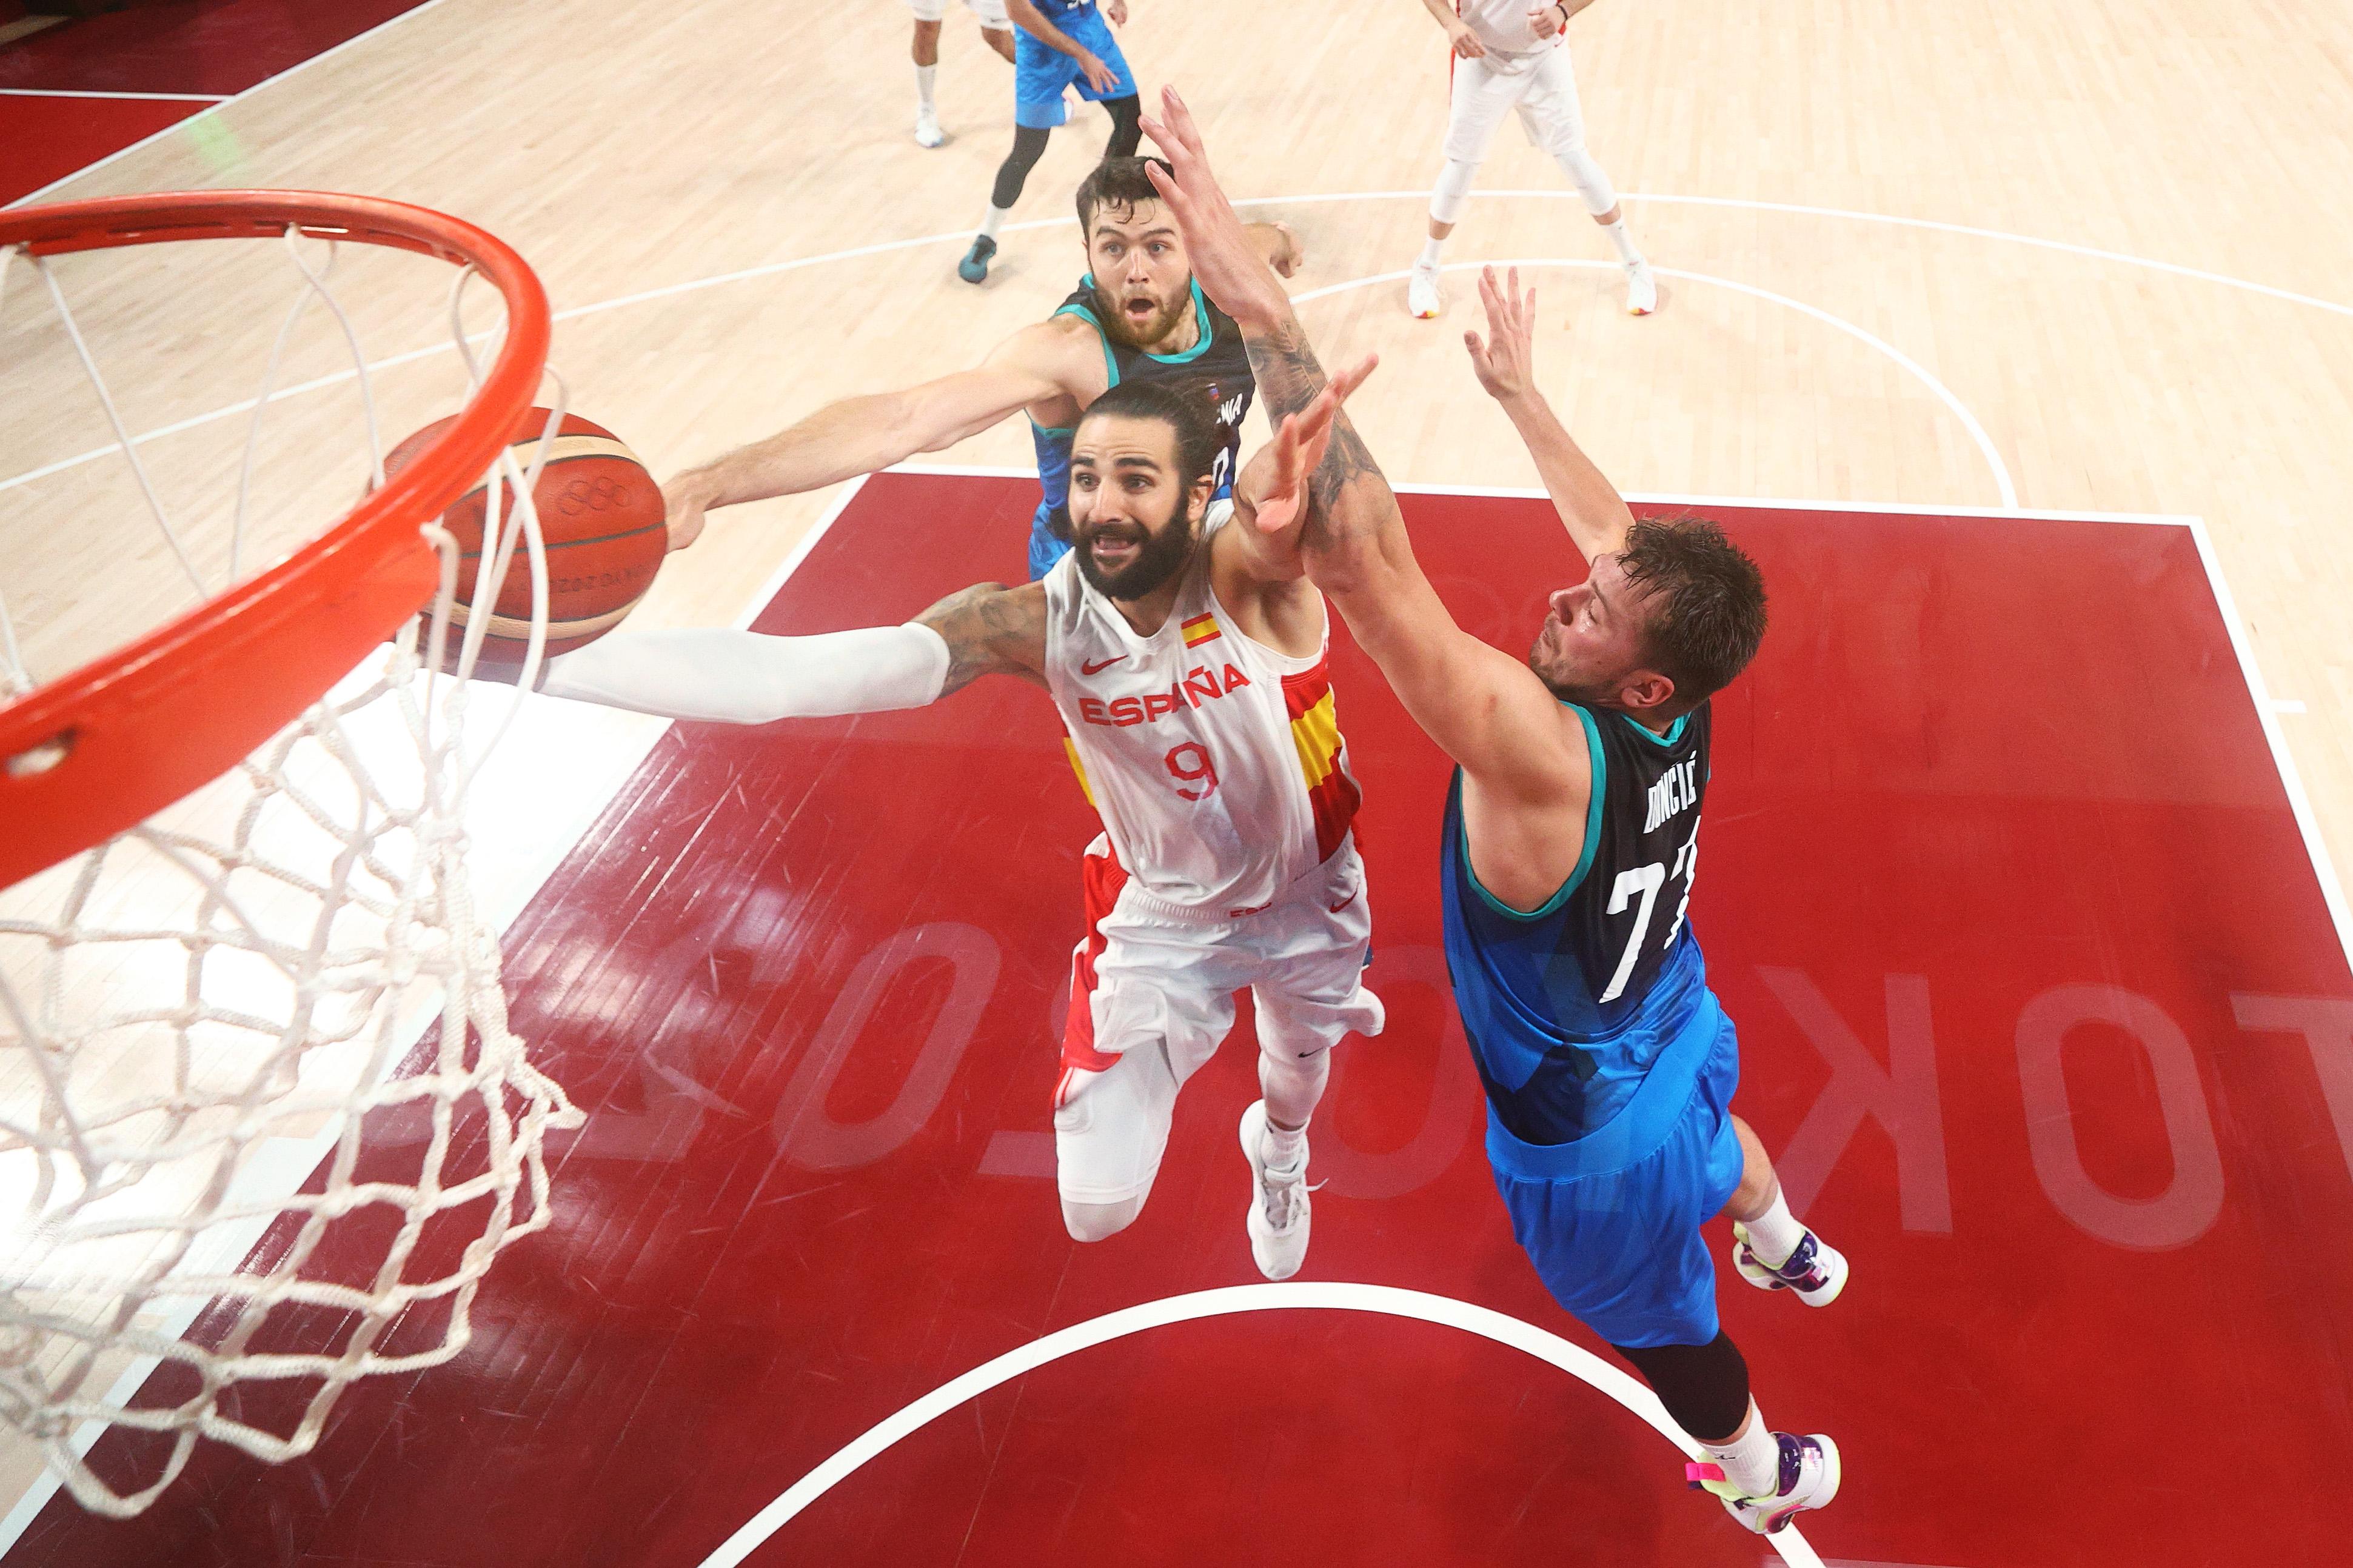 Spain v Slovenia Men's Basketball - Olympics: Day 9